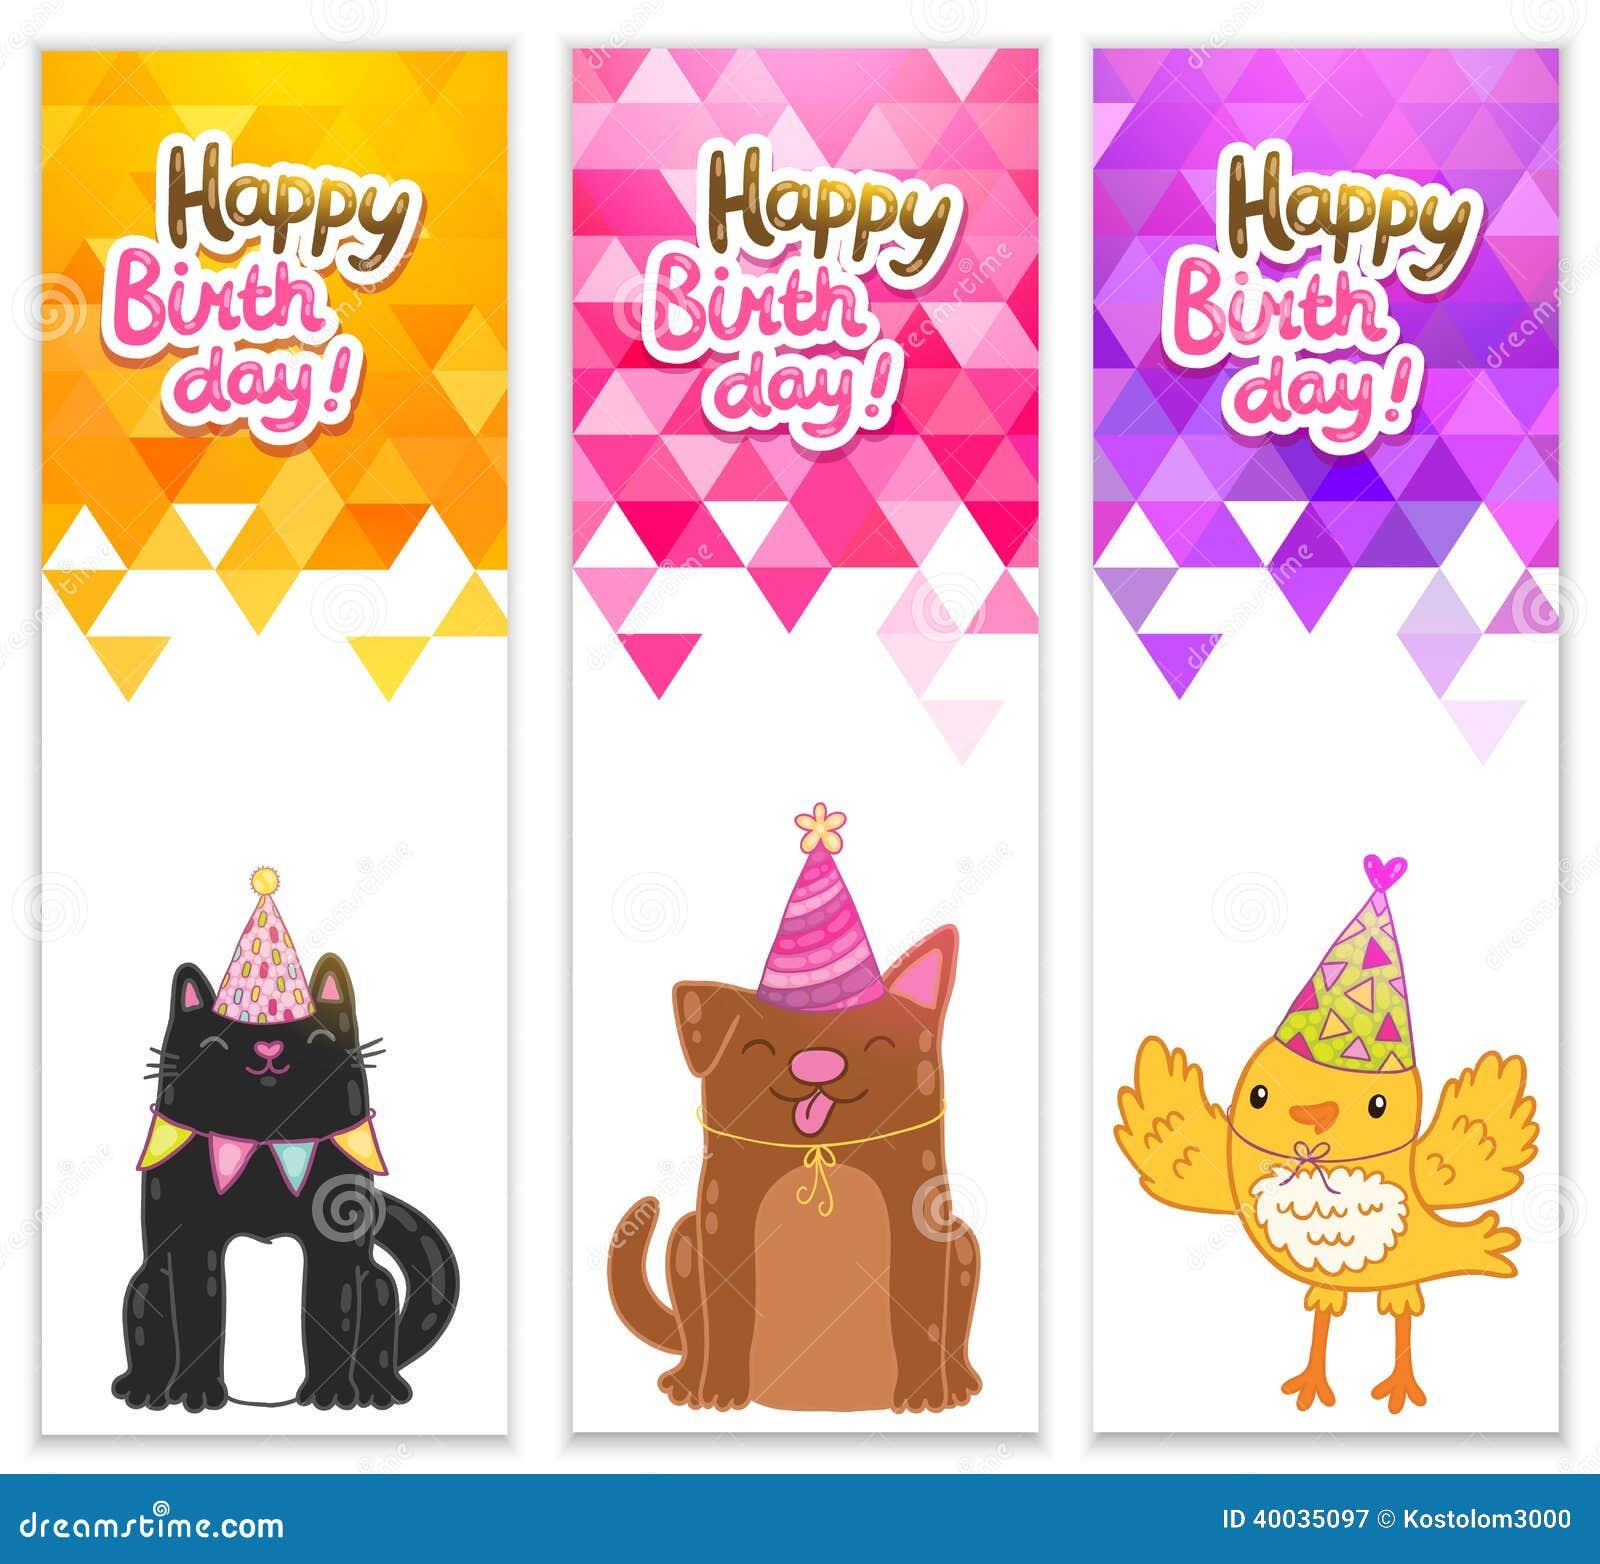 Cat Birthday Banner: Happy Birthday Banners With Cat, Dog, Bird Stock Vector